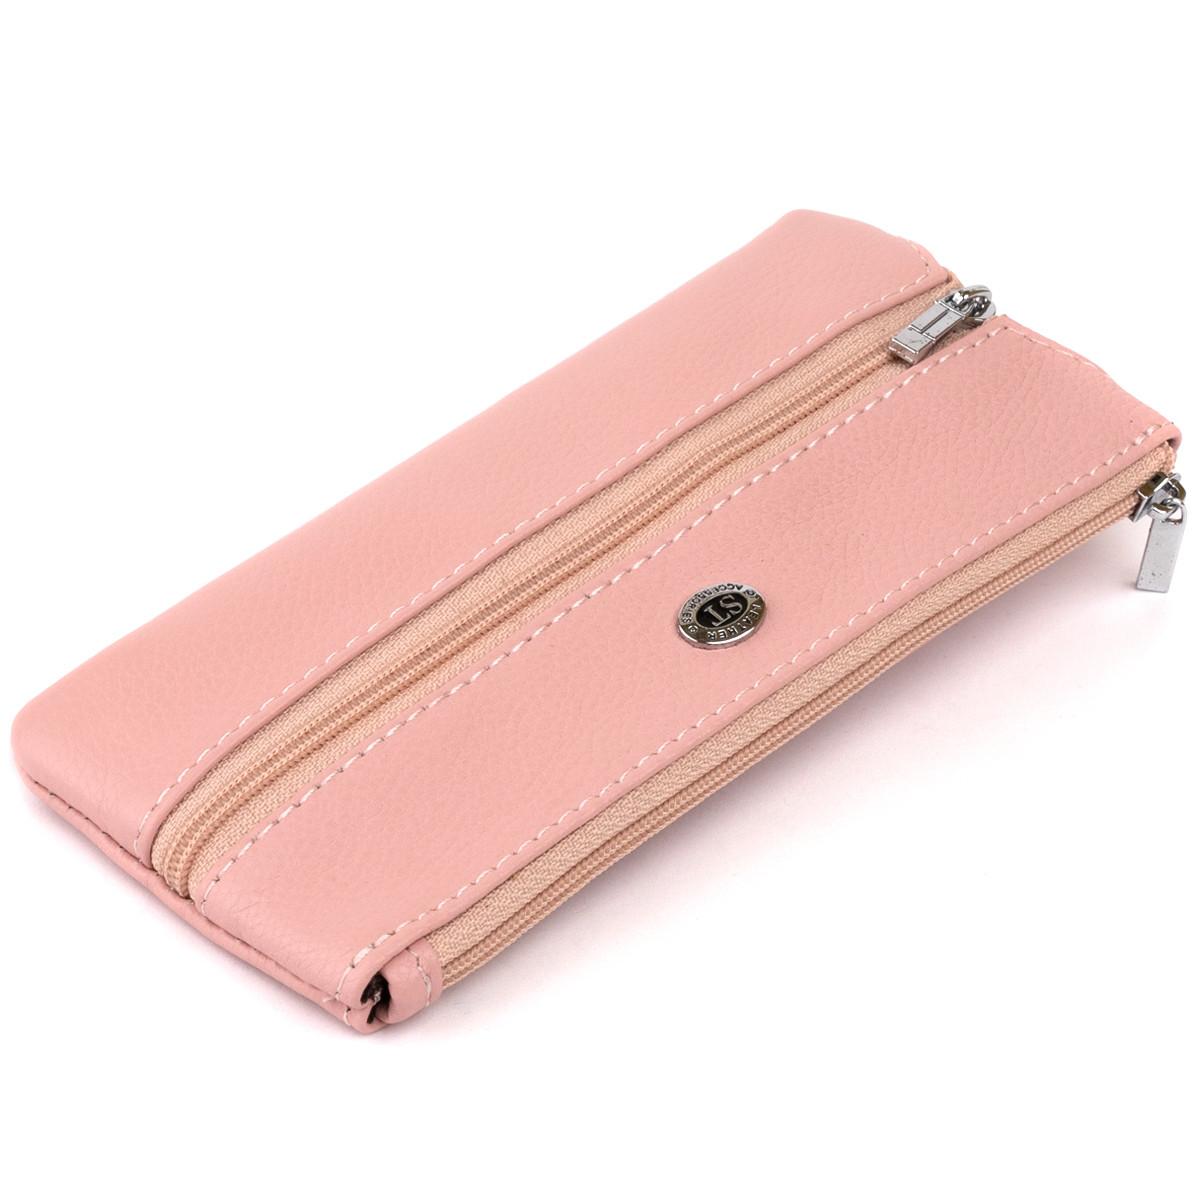 Ключница-кошелек с кармашком женская ST Leather 19353 Розовая